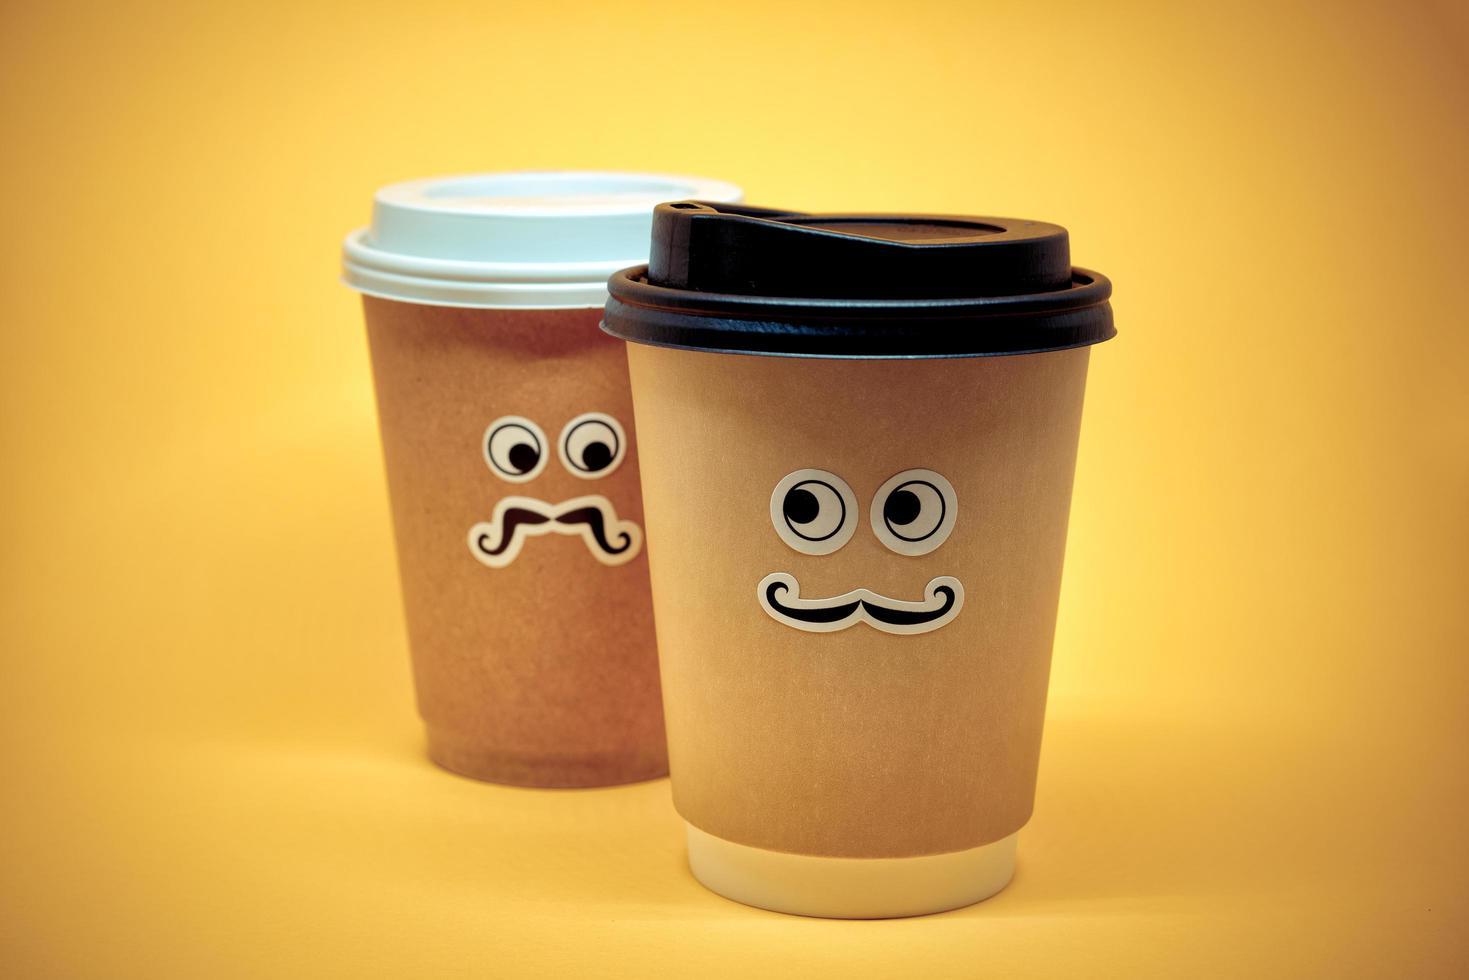 koffiekopjes kijken verdacht foto